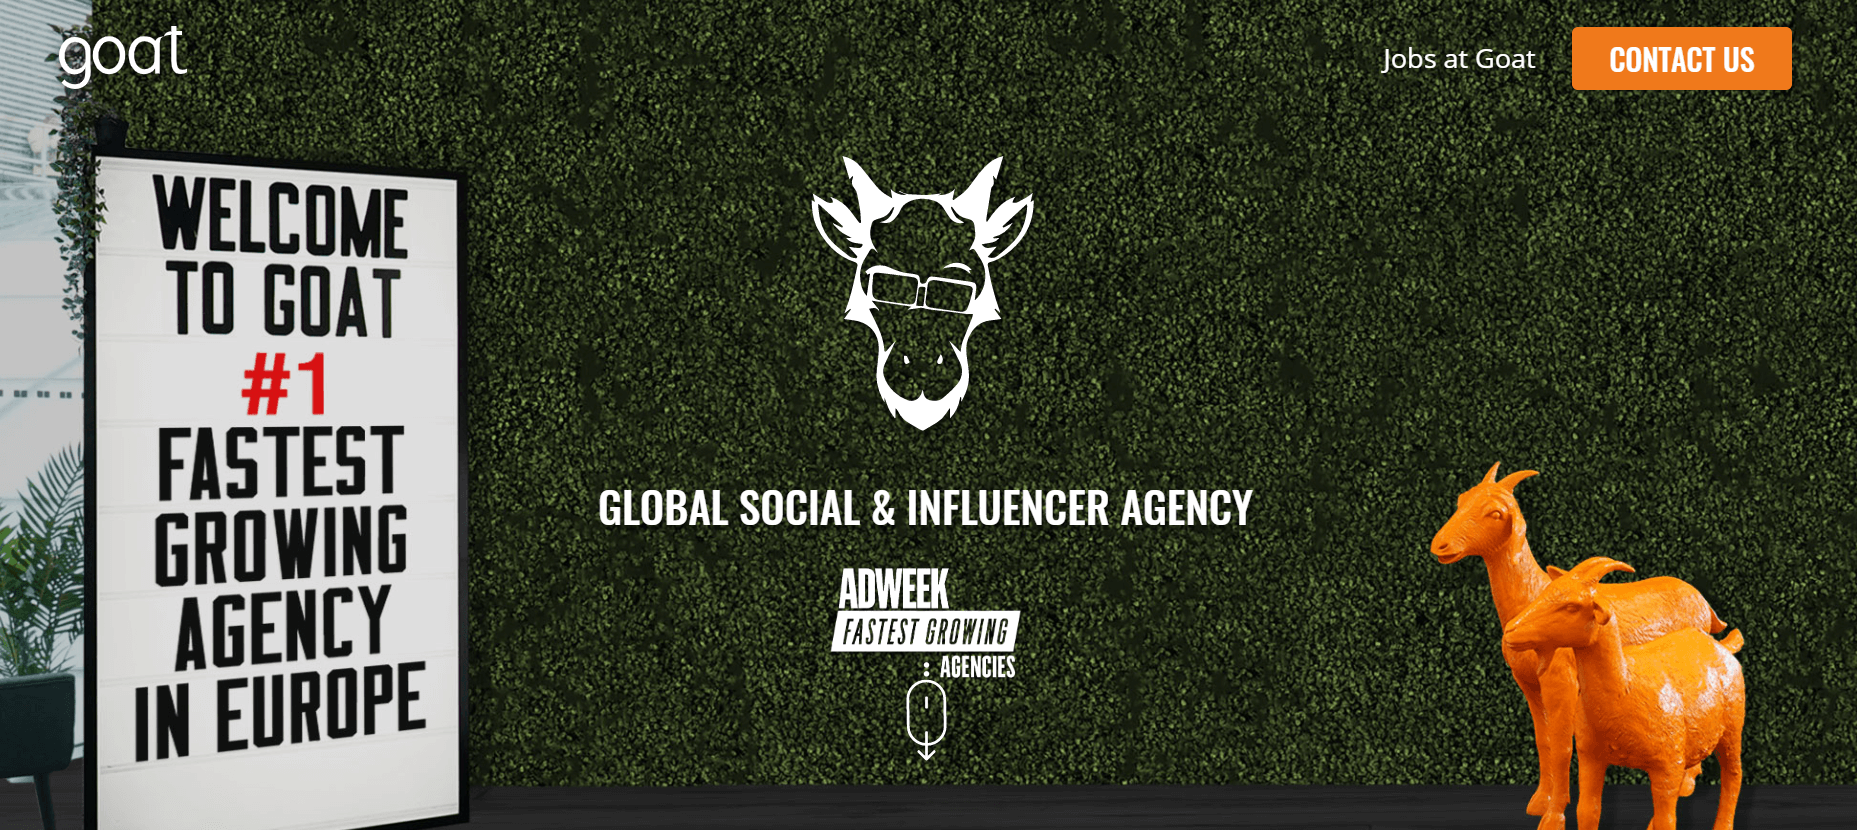 The Goat Agency Influencer Marketing Agency